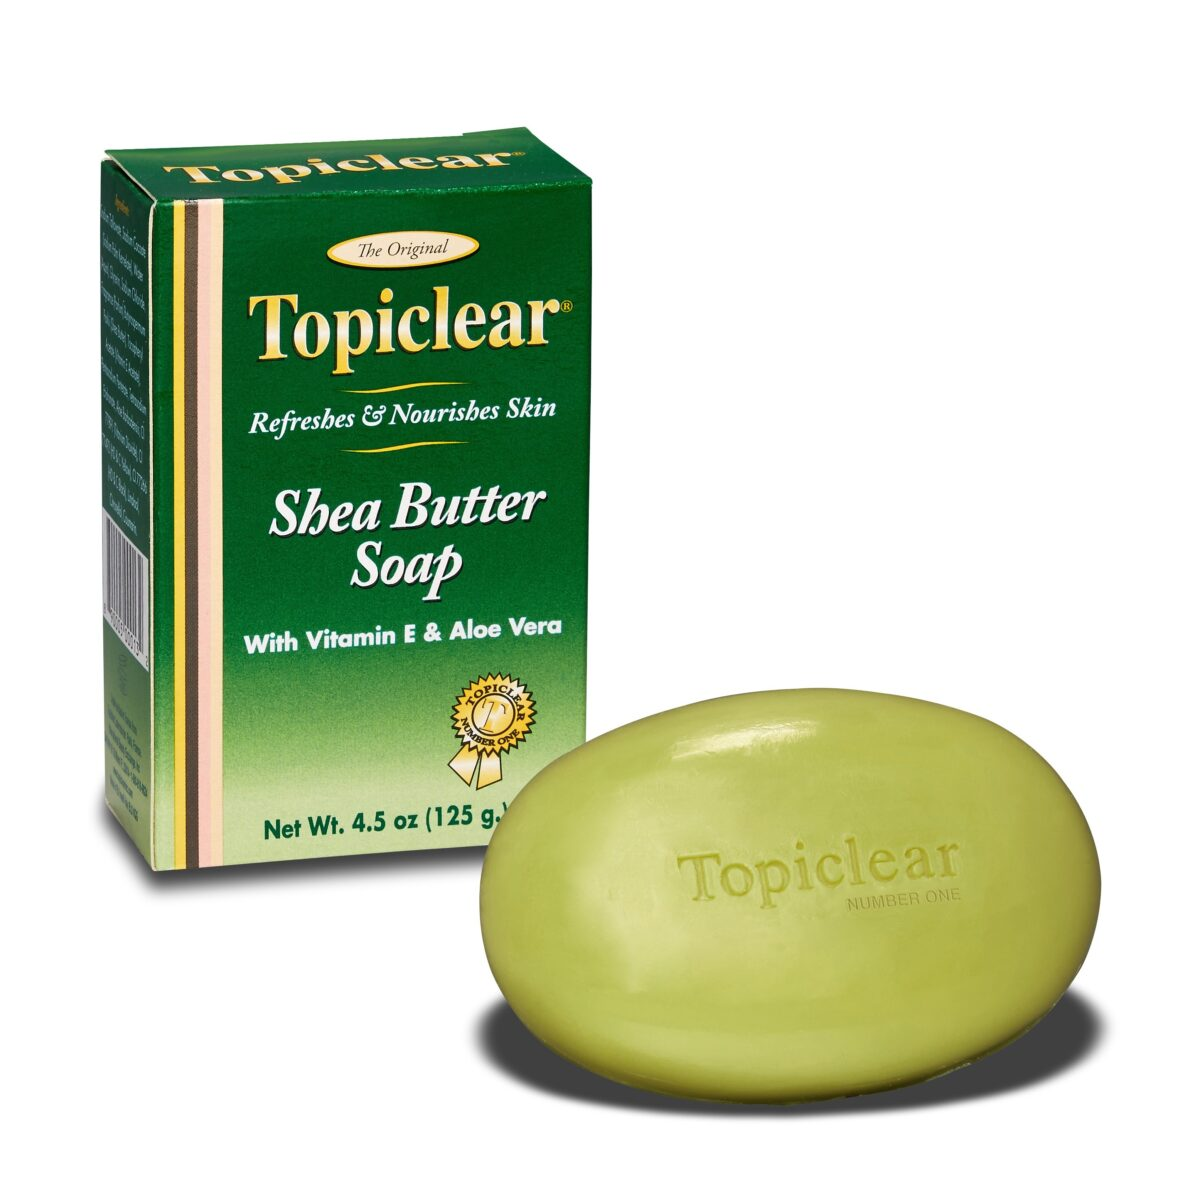 Topiclear Gold Shea Butter Soap